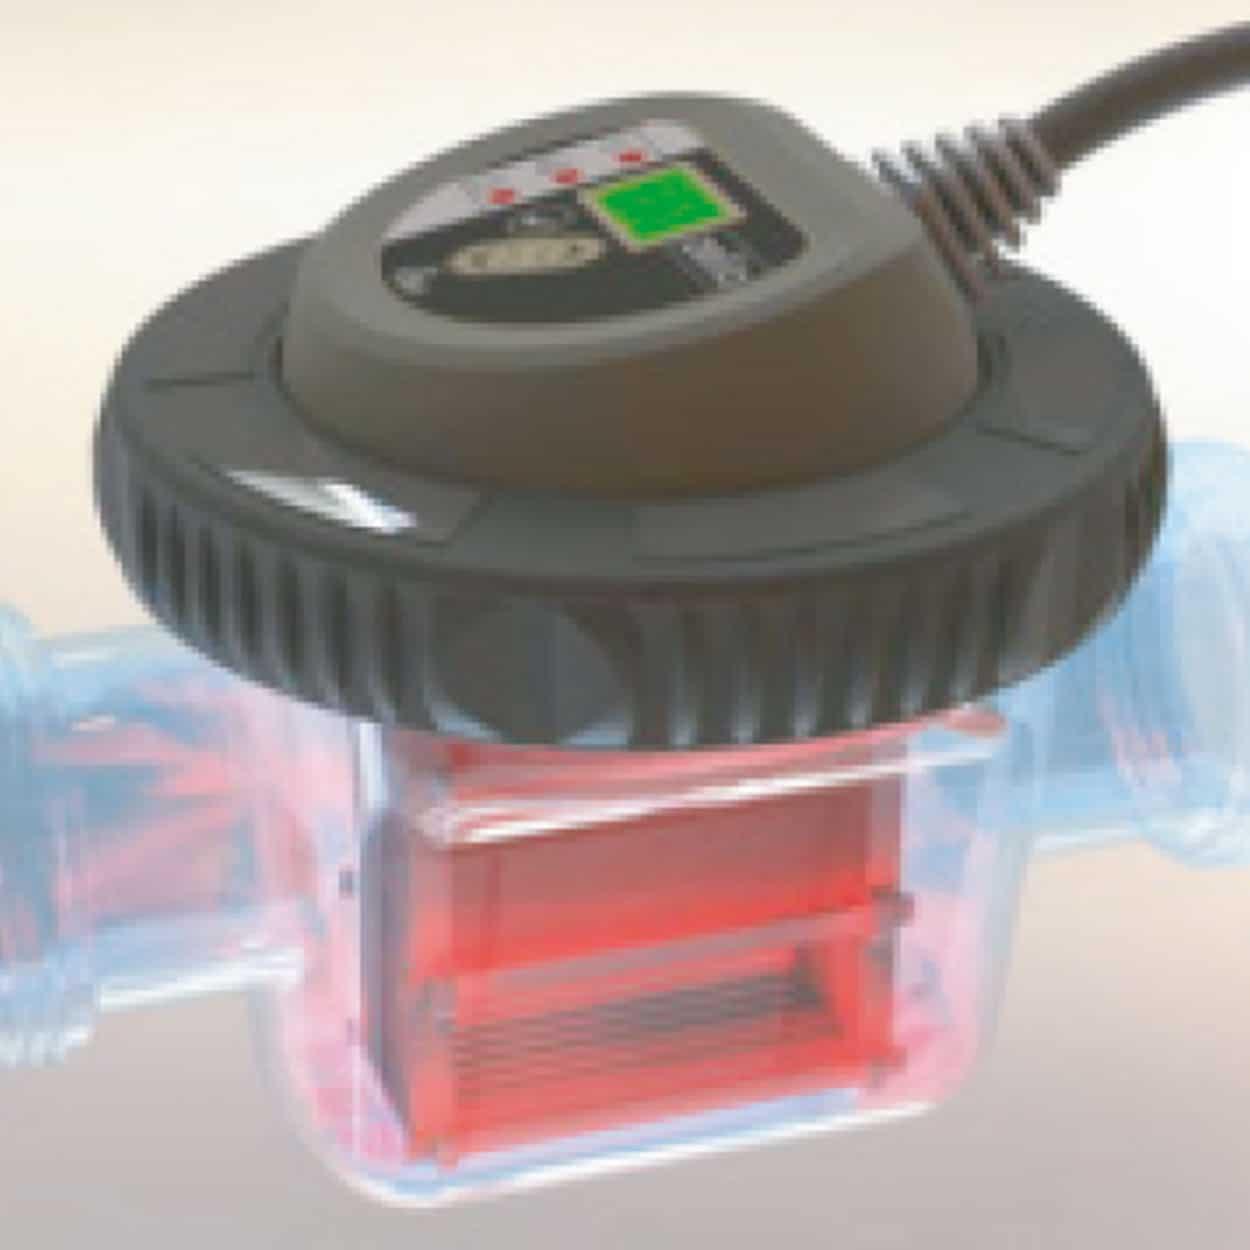 plugandswim-electrolyseur-thermoregulateur Odalia - Déclinaison PLUG & SWIM - Les atouts